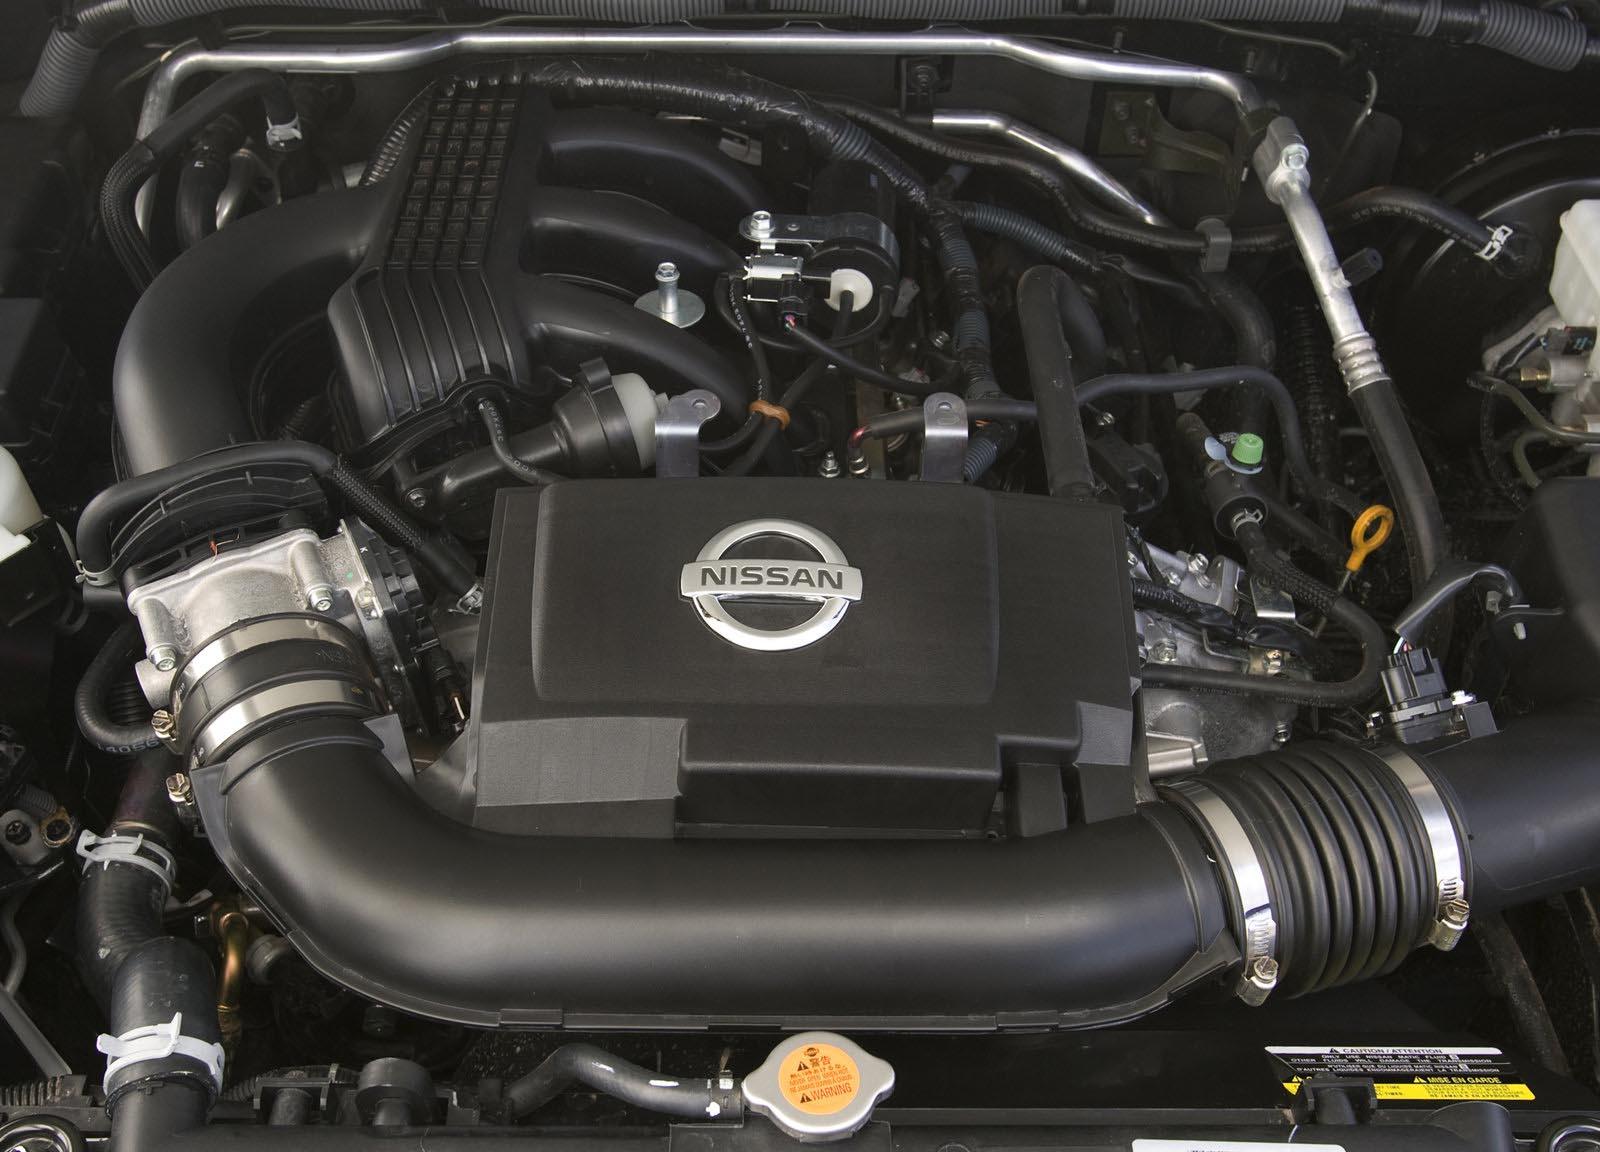 2005 Nissan Xterra Engine Bing Images